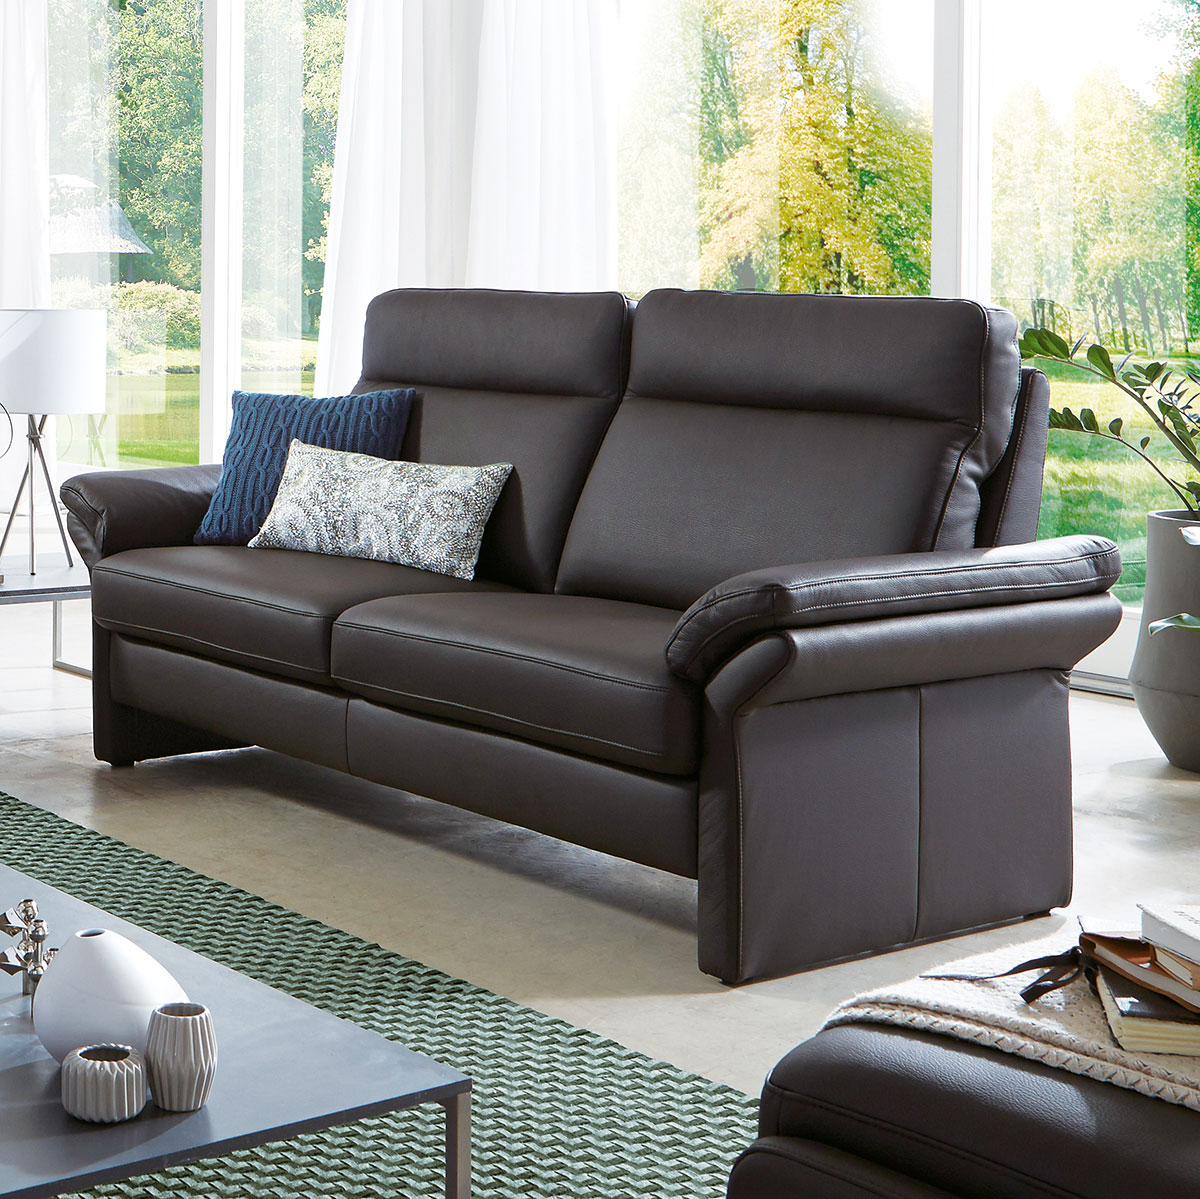 Sofa, 2-Sitzer FL601 in Leder schwarz